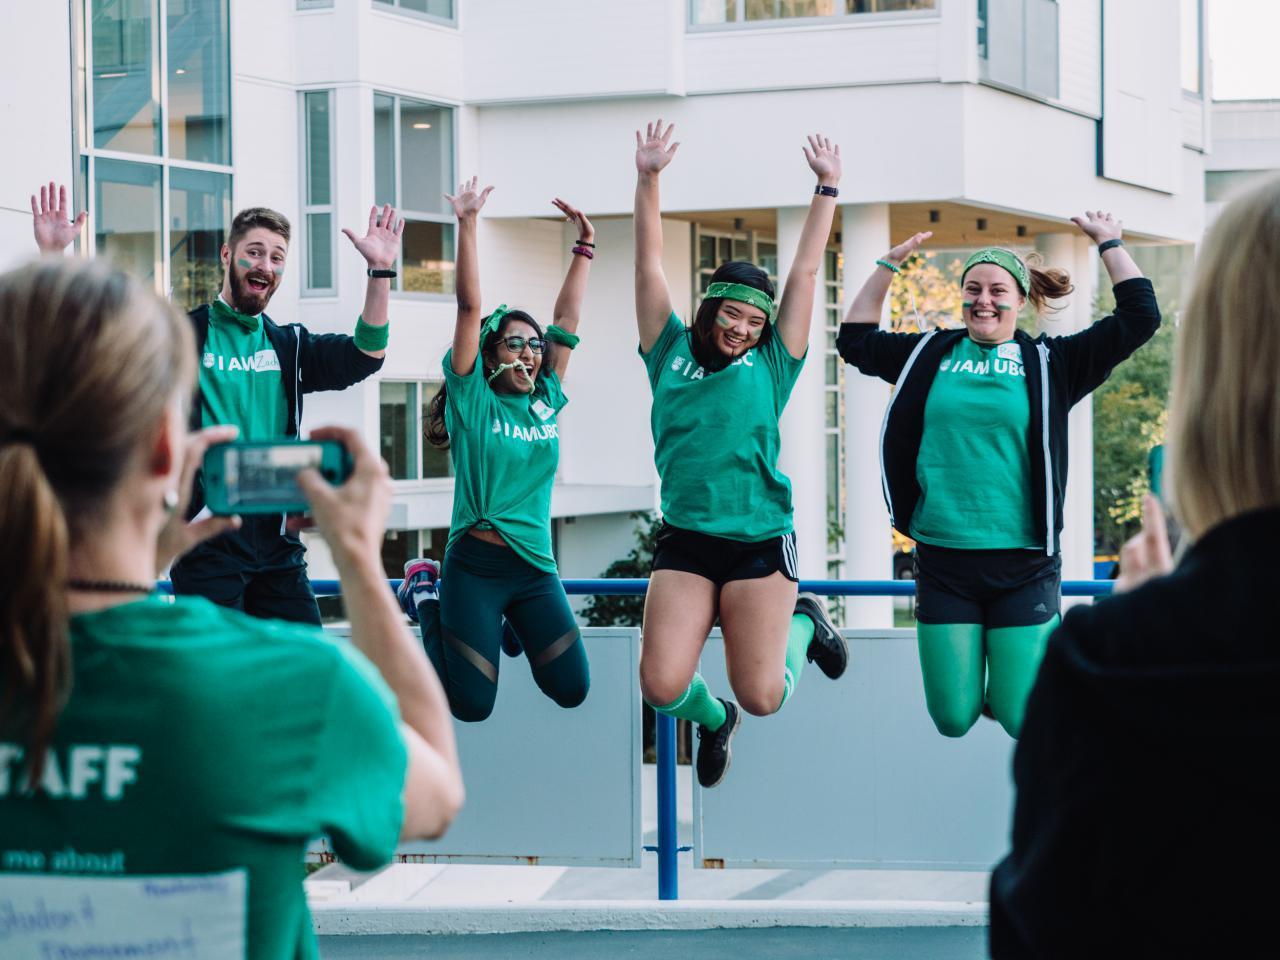 UBC-Imagine-Day-2018-Kinesiology-7.jpg